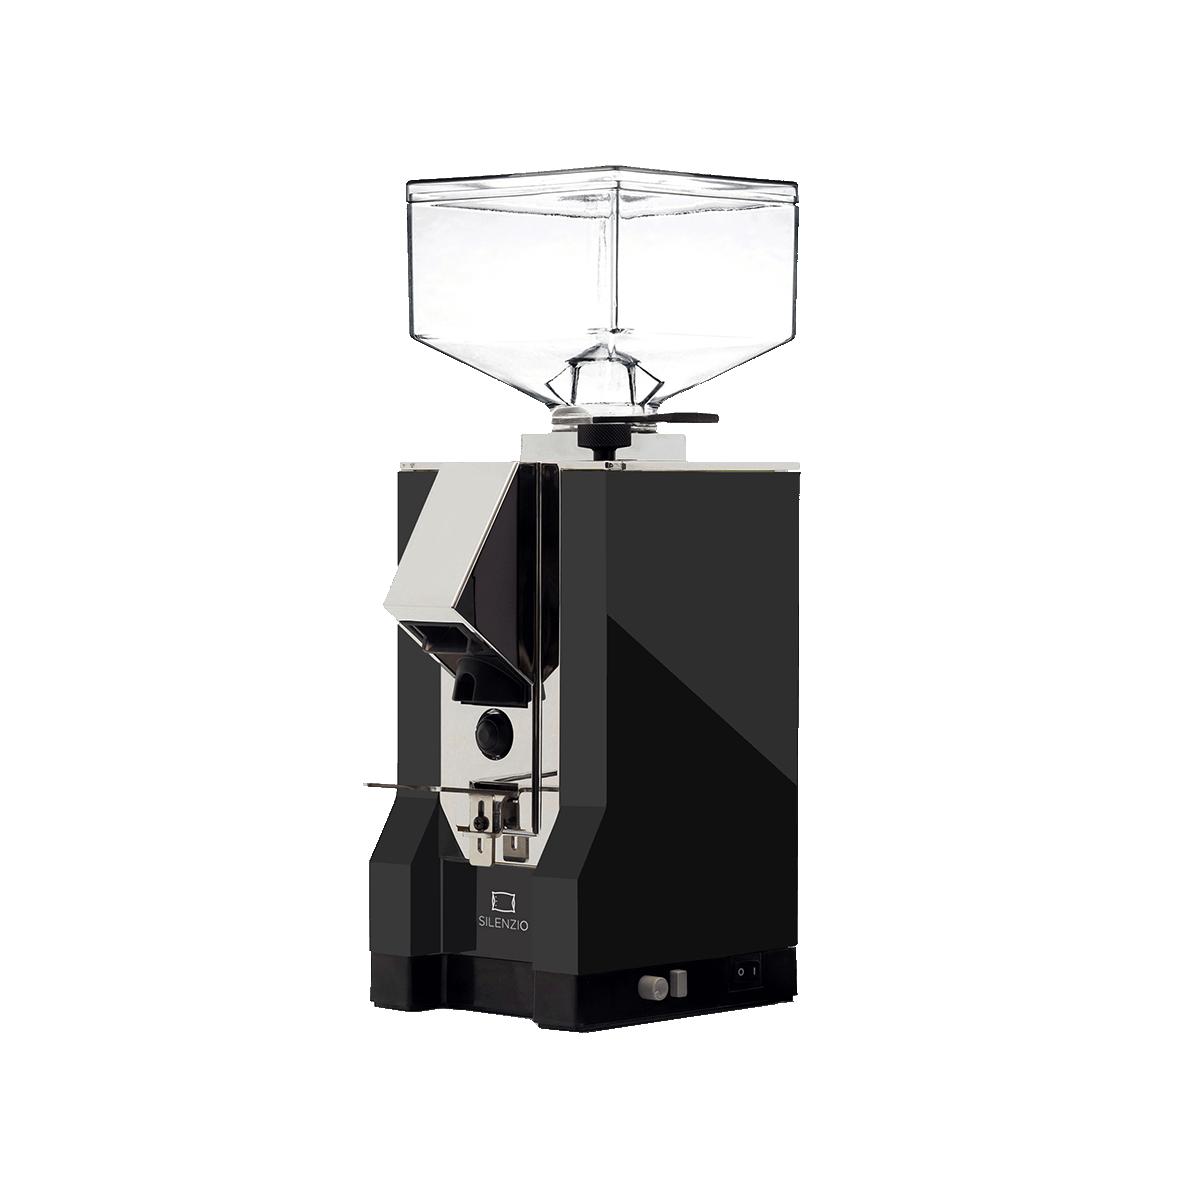 Coffee Grinder – Eureka Mignon Silenzio Mat Black & Chrome